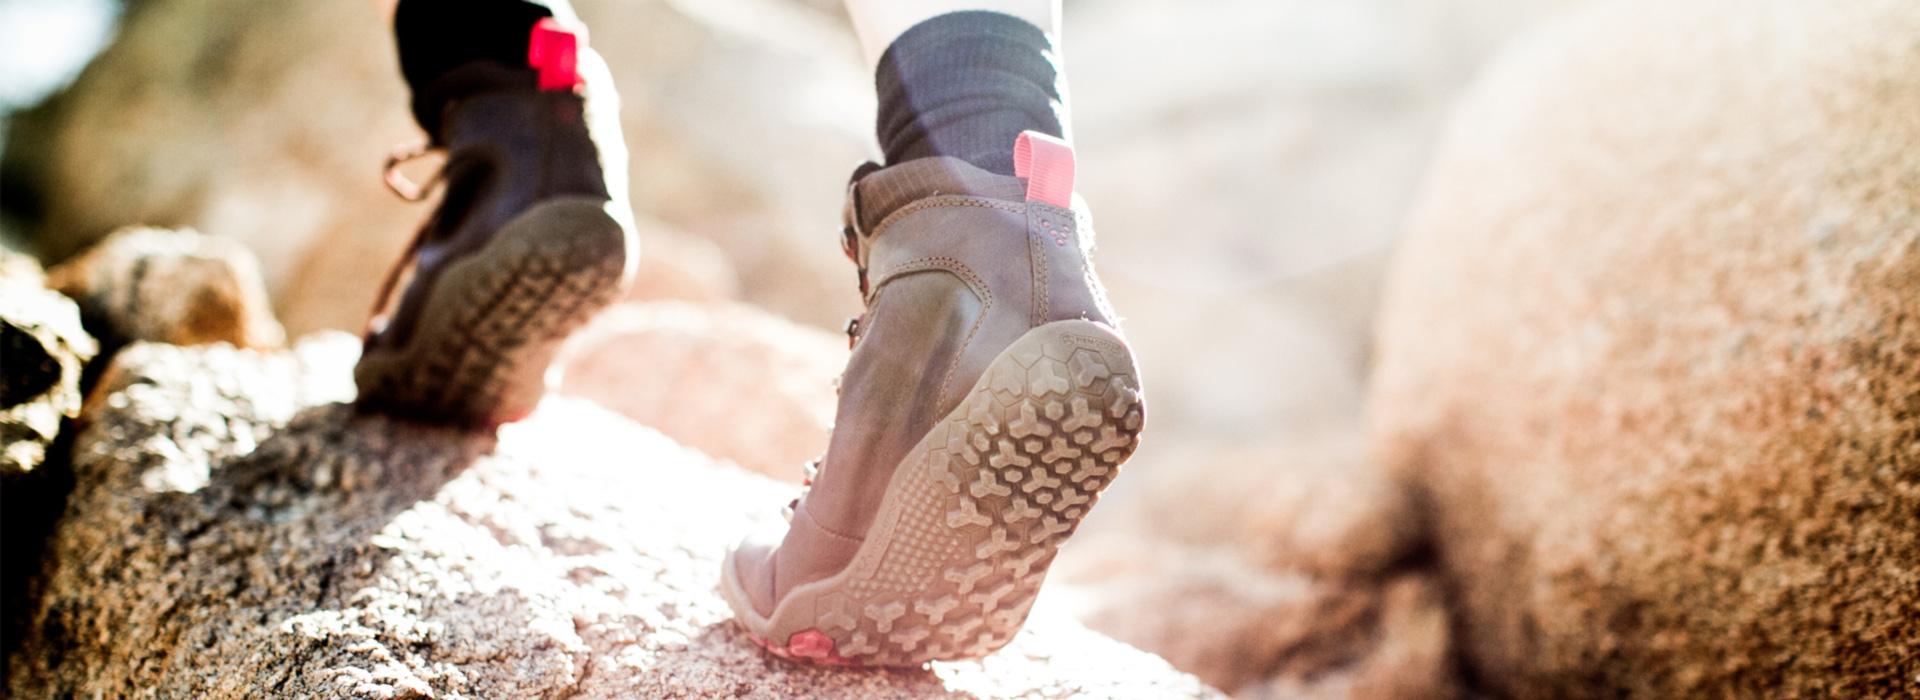 47a04d1b42d Lyst Vivobarefoot Tracker Firm Ground black Men s Hiking Boots in Black for  Men Source · Vivobarefoot